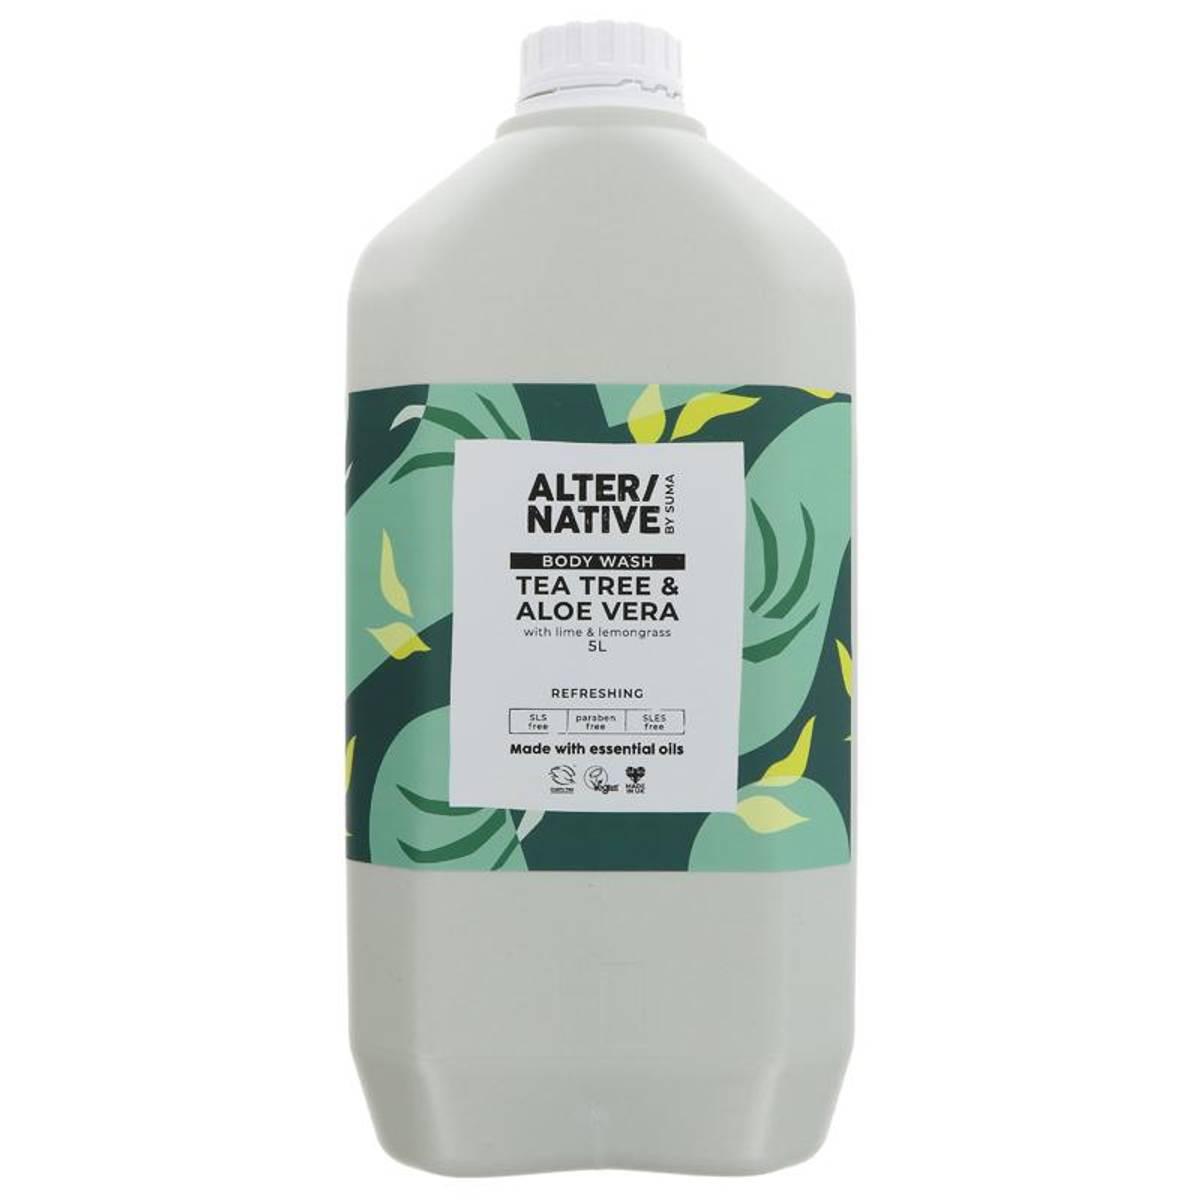 5L flytende dusjsåpe Tea Tree Aloe & Lime / Alter/native